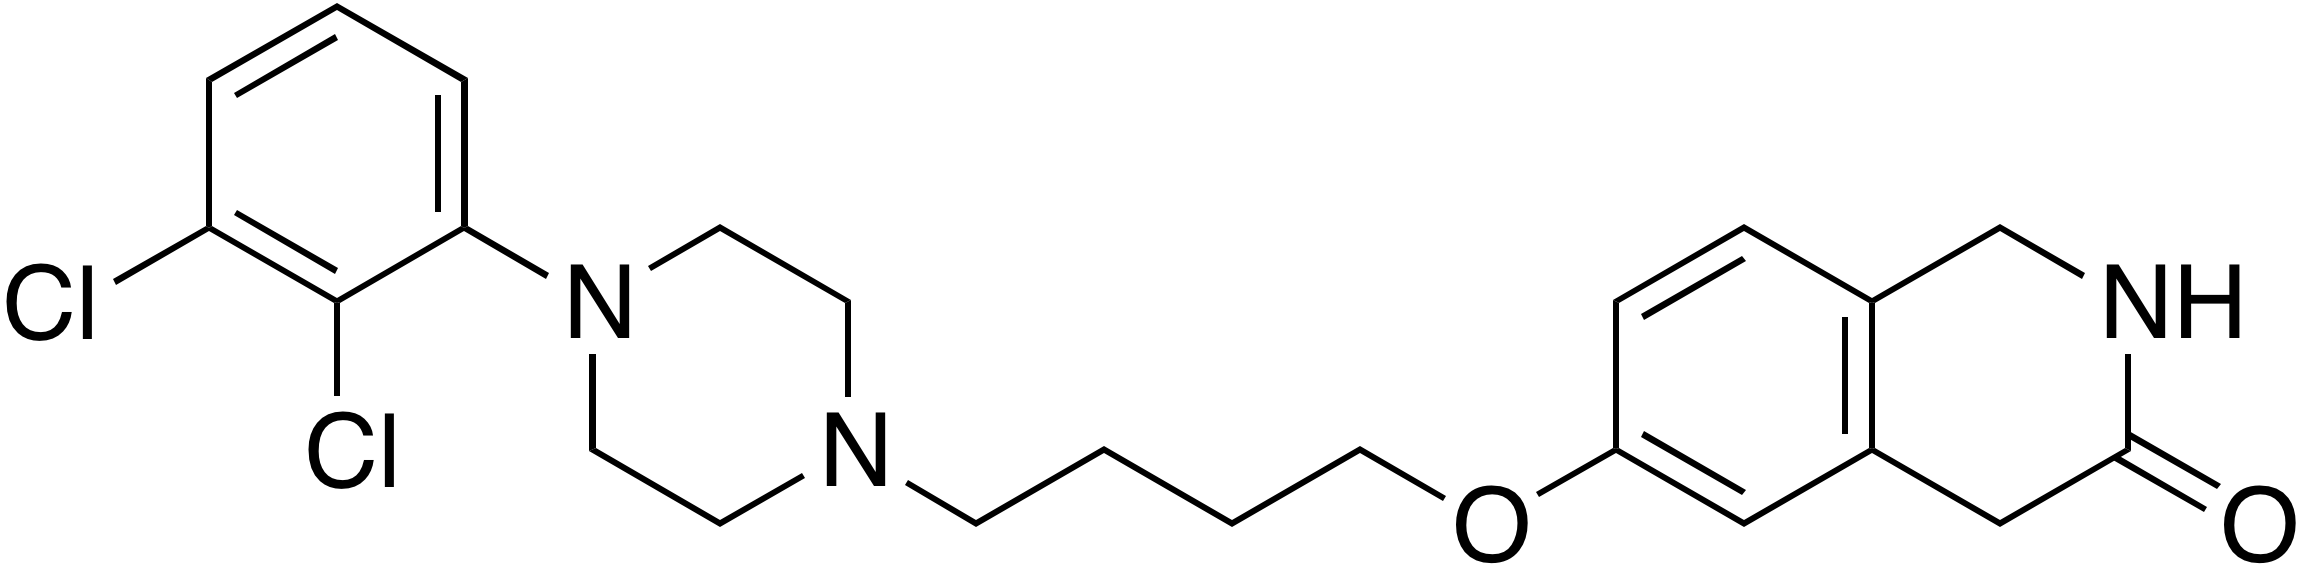 Aripiprazole impurity 10